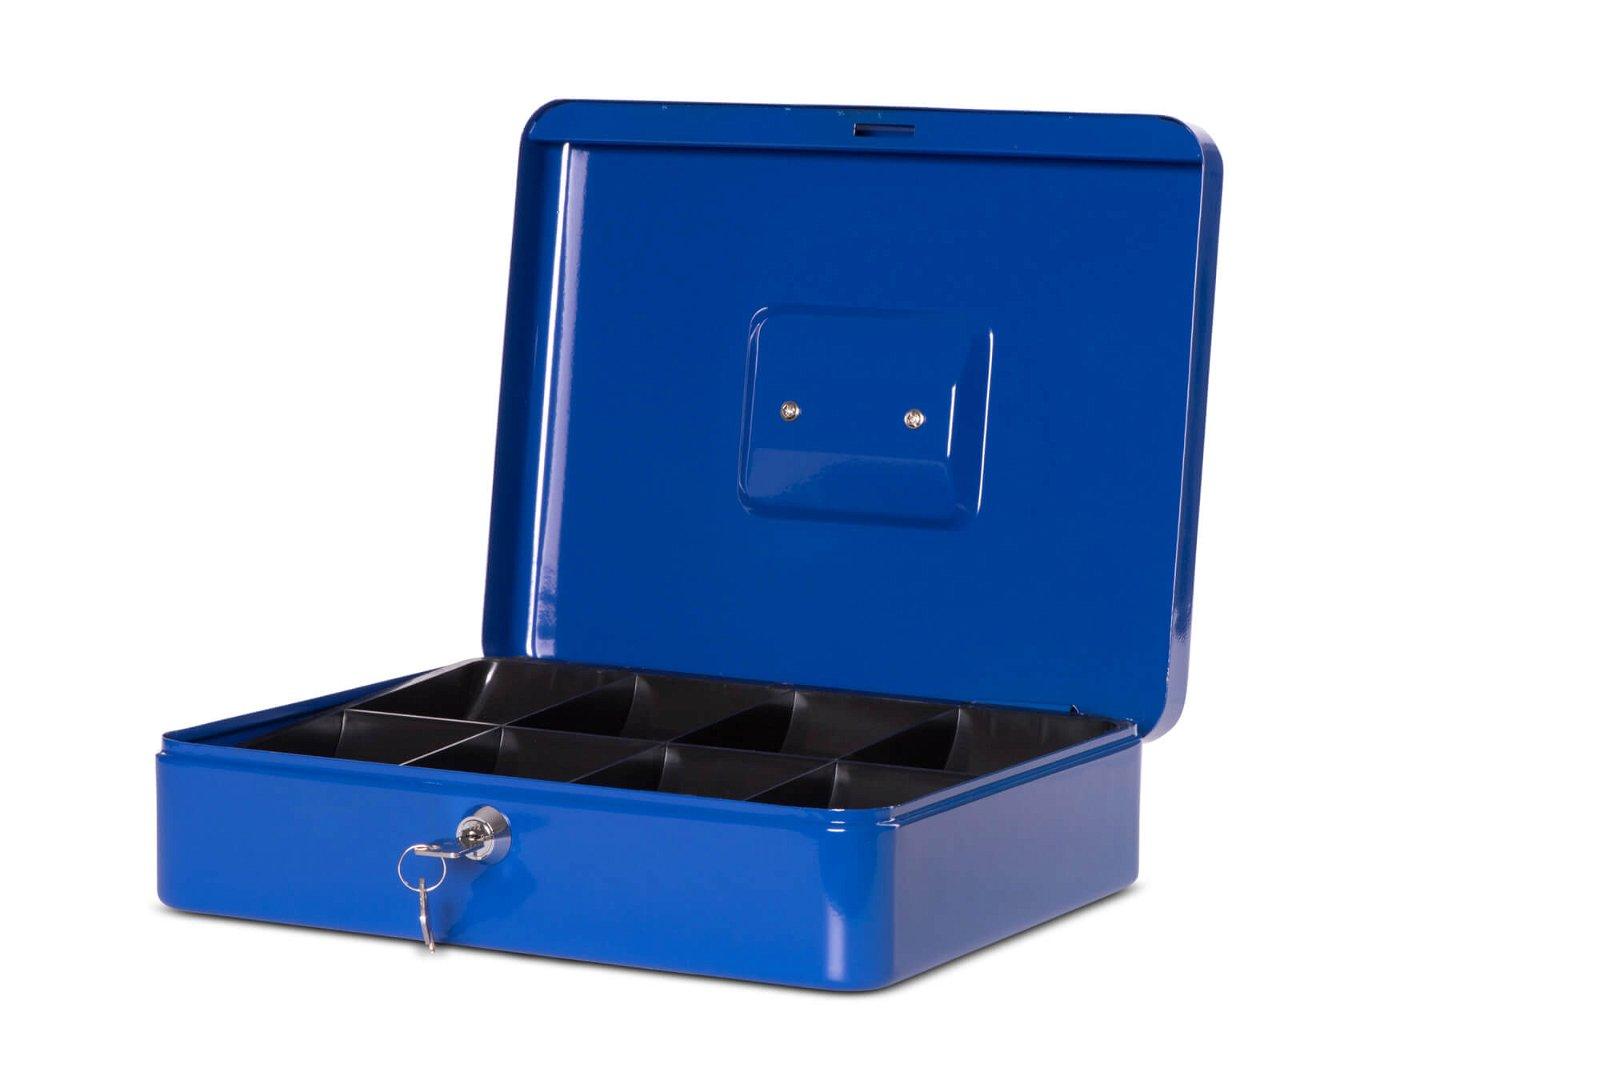 Geldkassette 4, 30 x 24,5 x 9 cm, blau